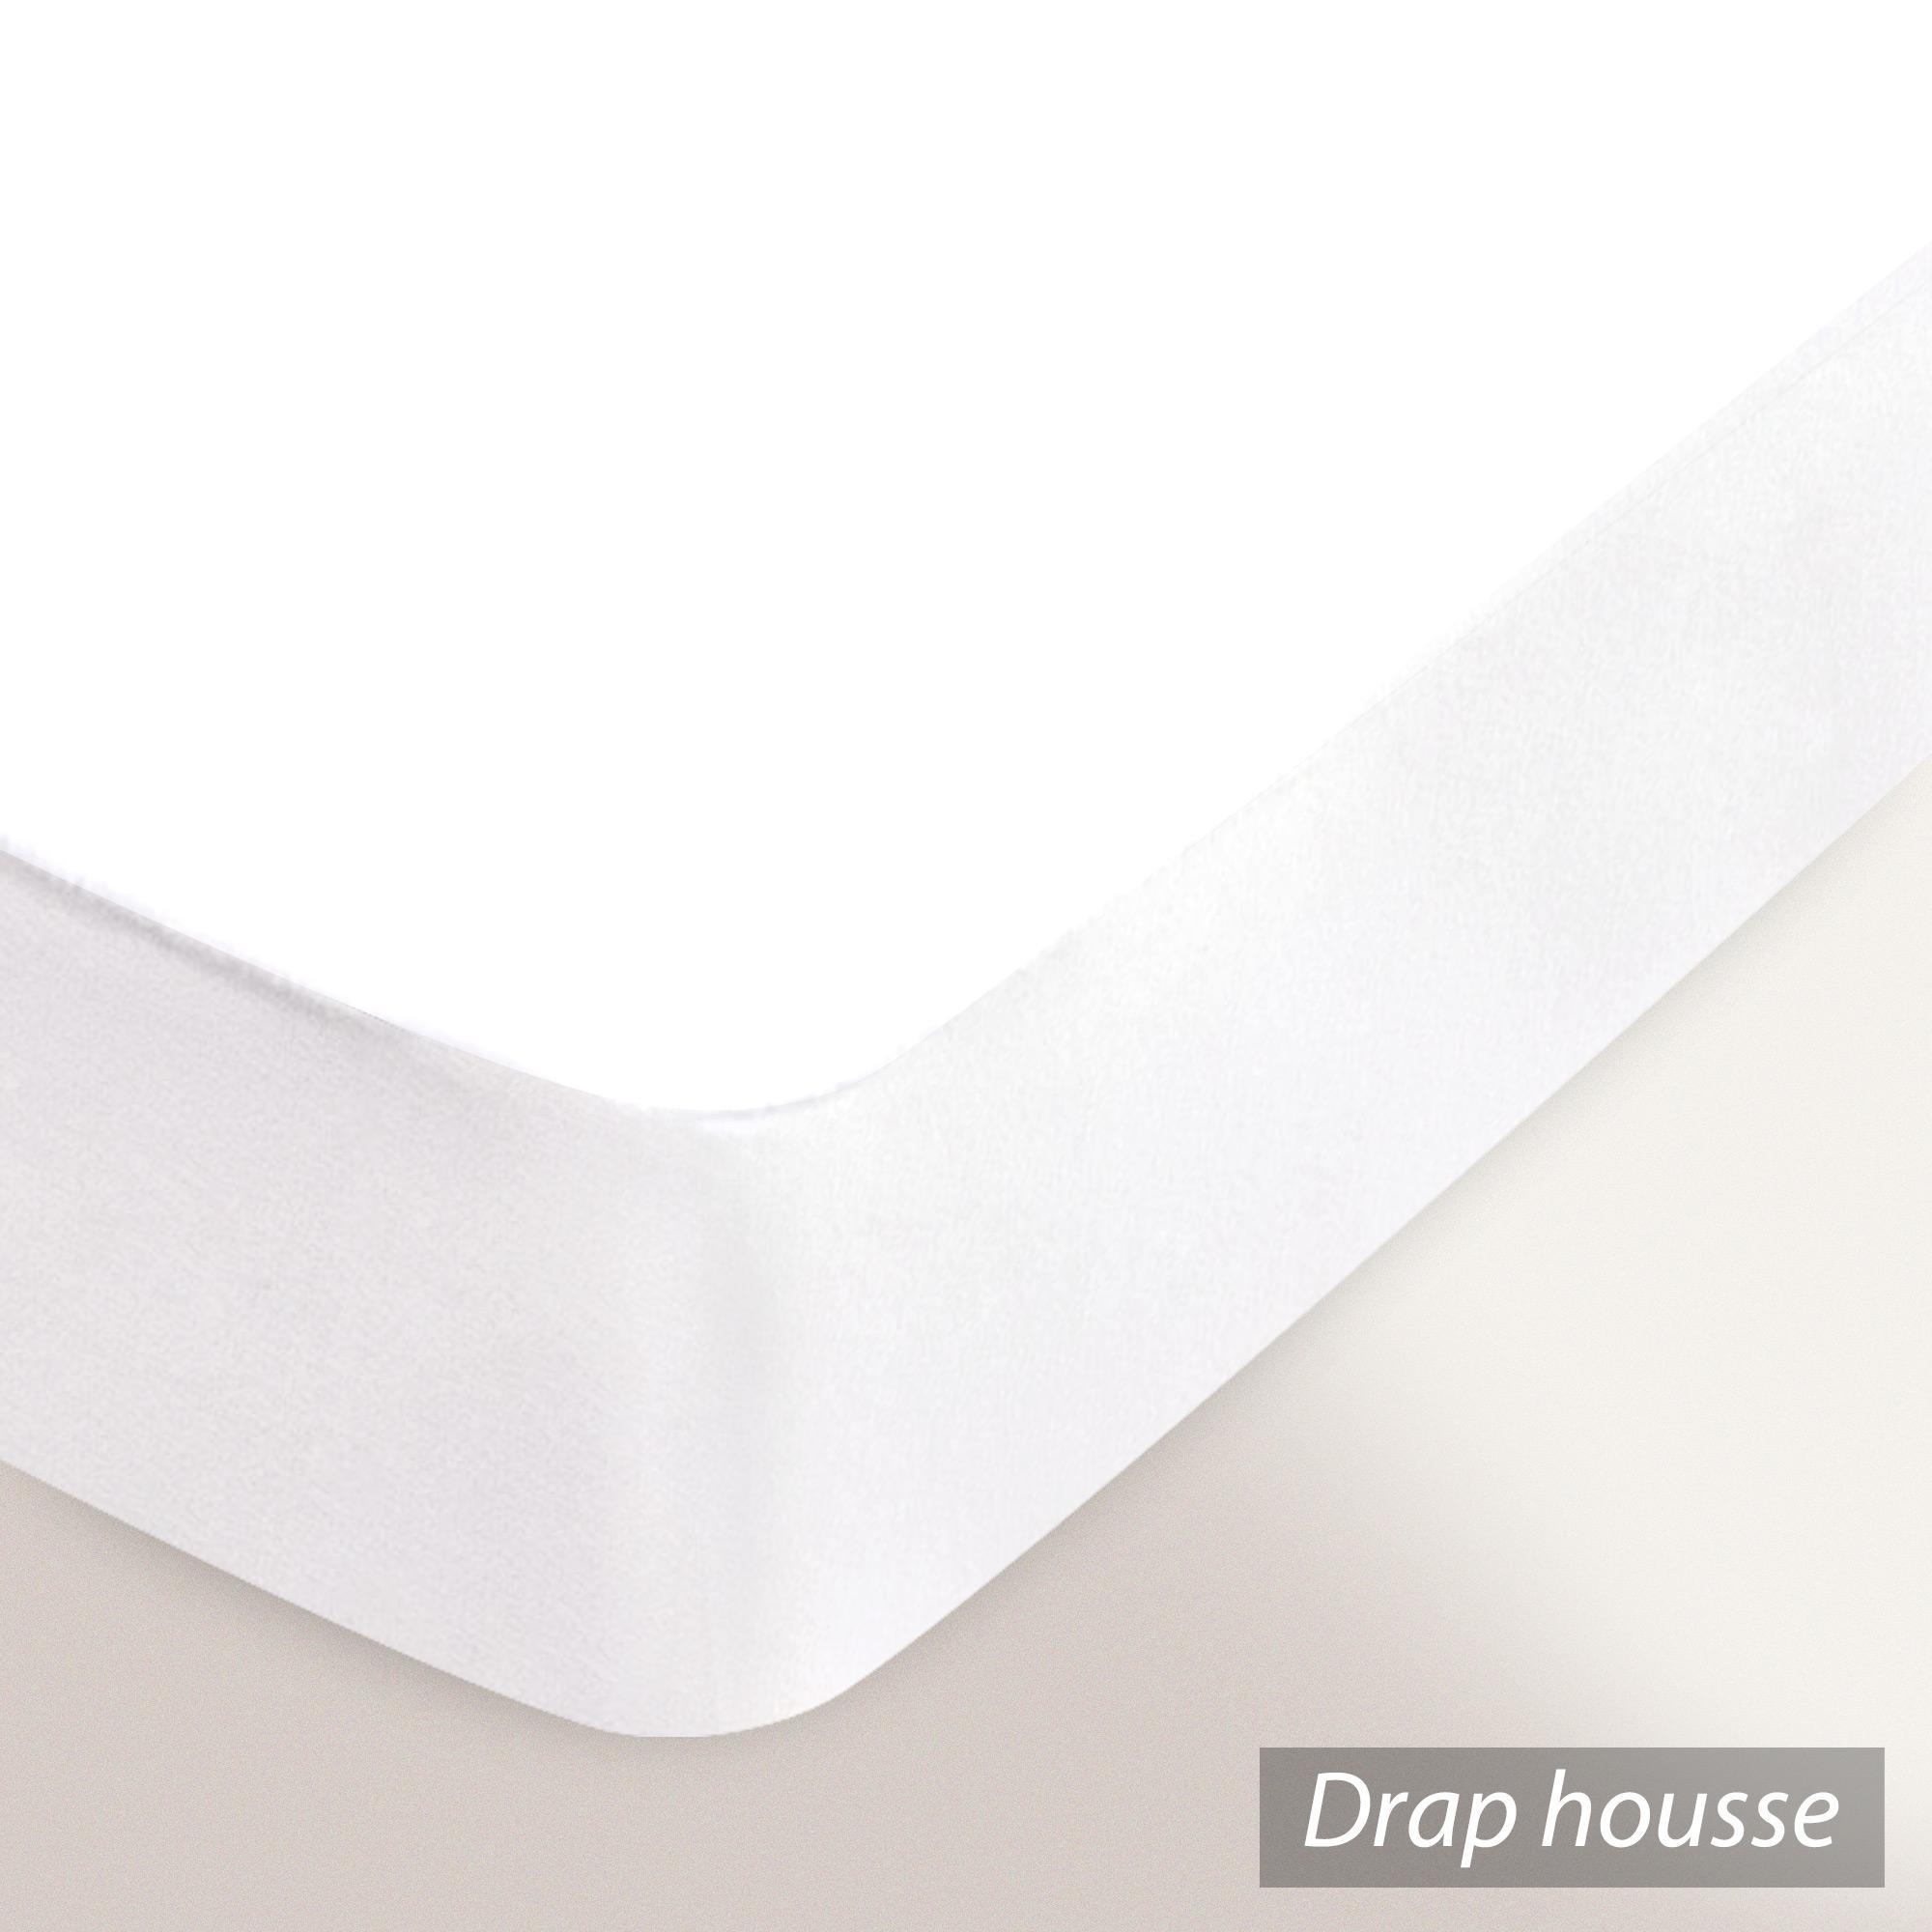 prot ge matelas 130x190 achua molleton 100 coton 400g m2. Black Bedroom Furniture Sets. Home Design Ideas